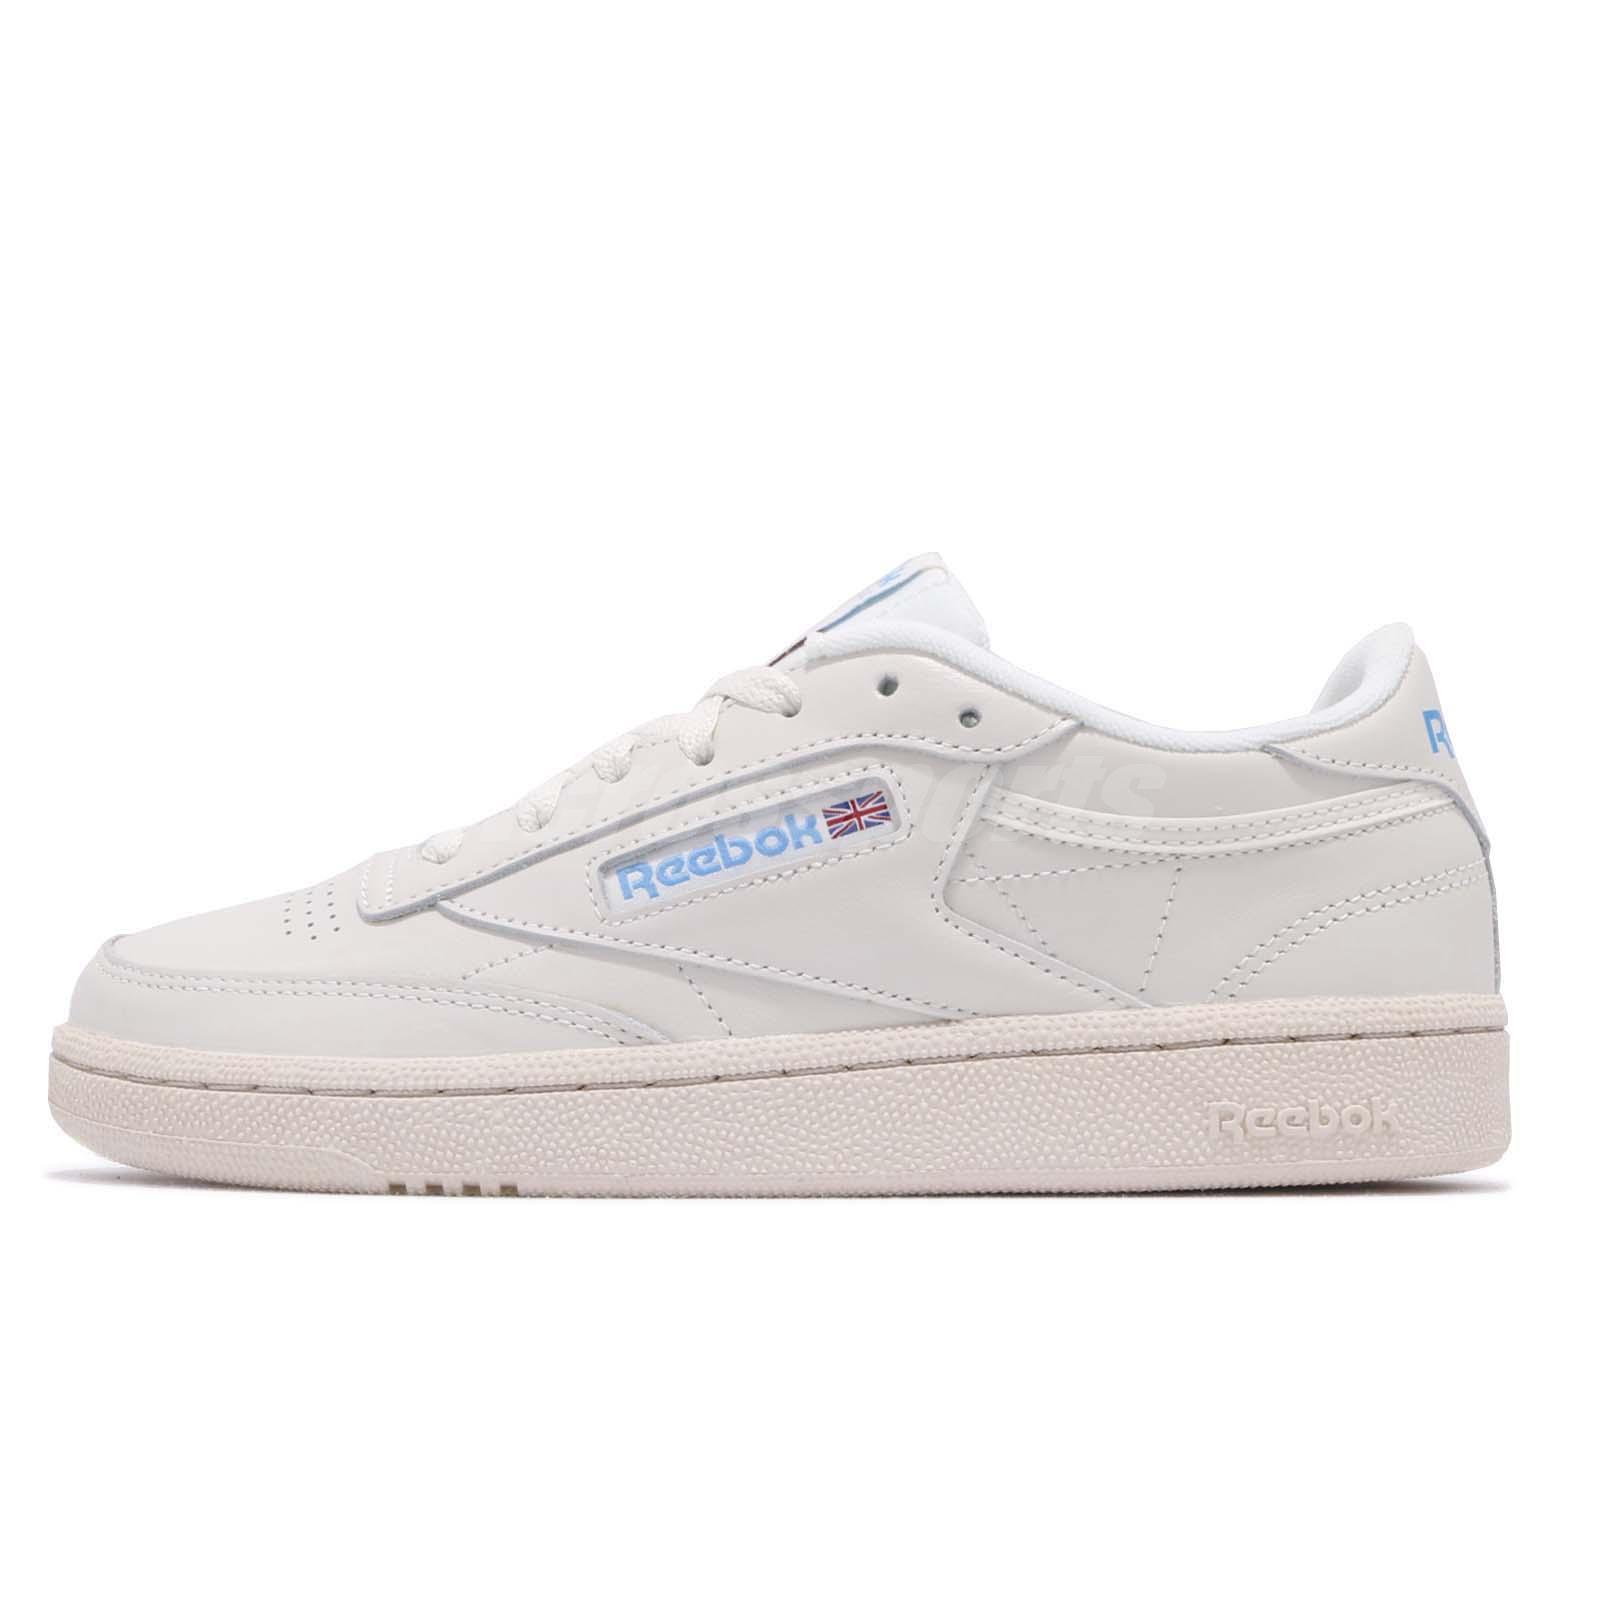 19f595e2ae1 Reebok Club C 85 Vintage Beige Chalk Blue Womens Casual Shoes Sneakers  V69406